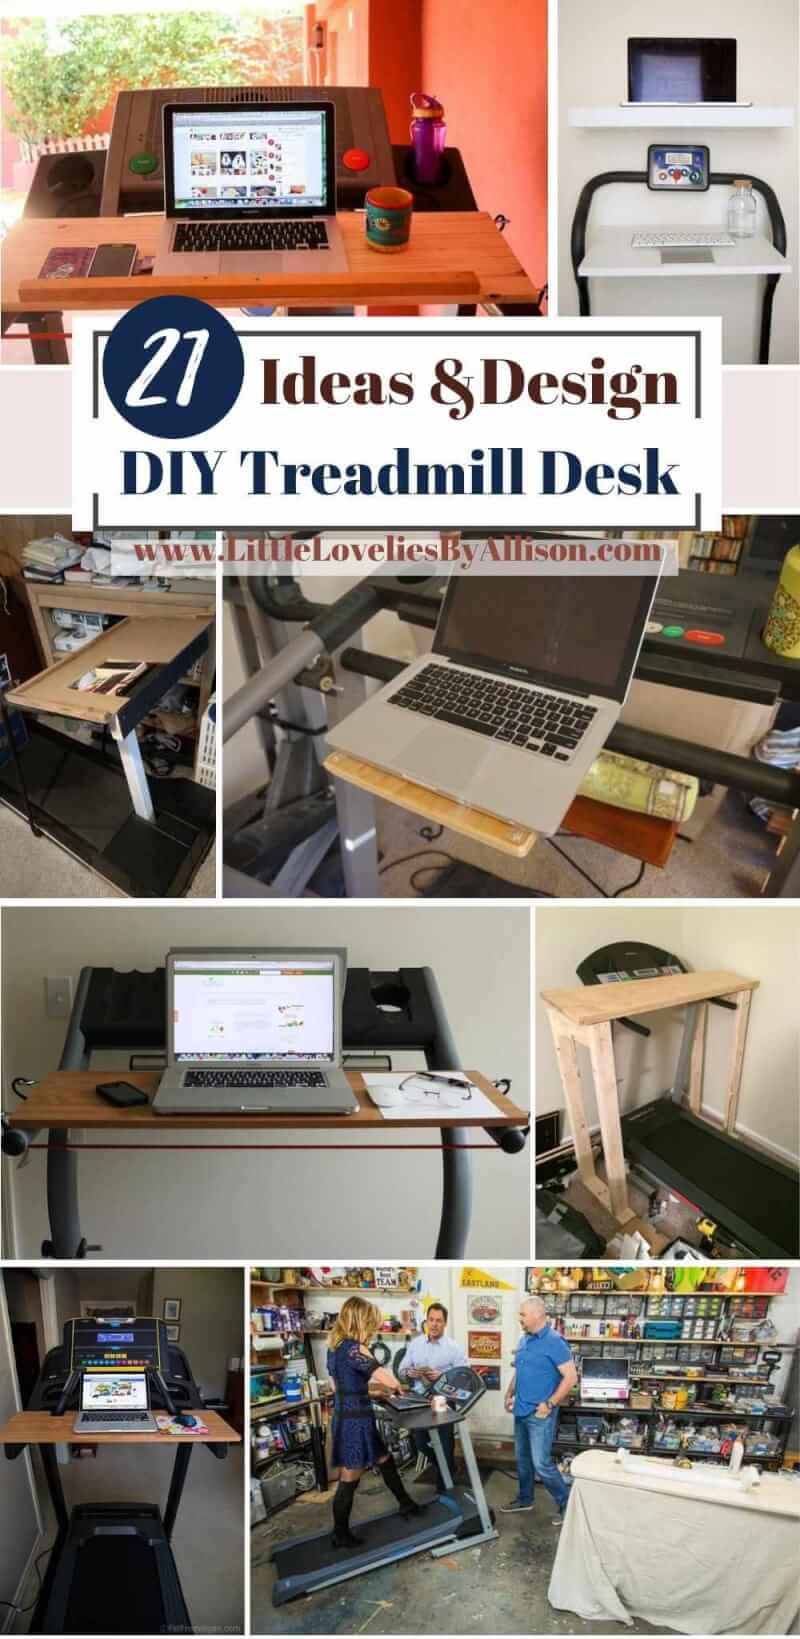 21 Ways To Build A DIY Treadmill Desk Like A Pro